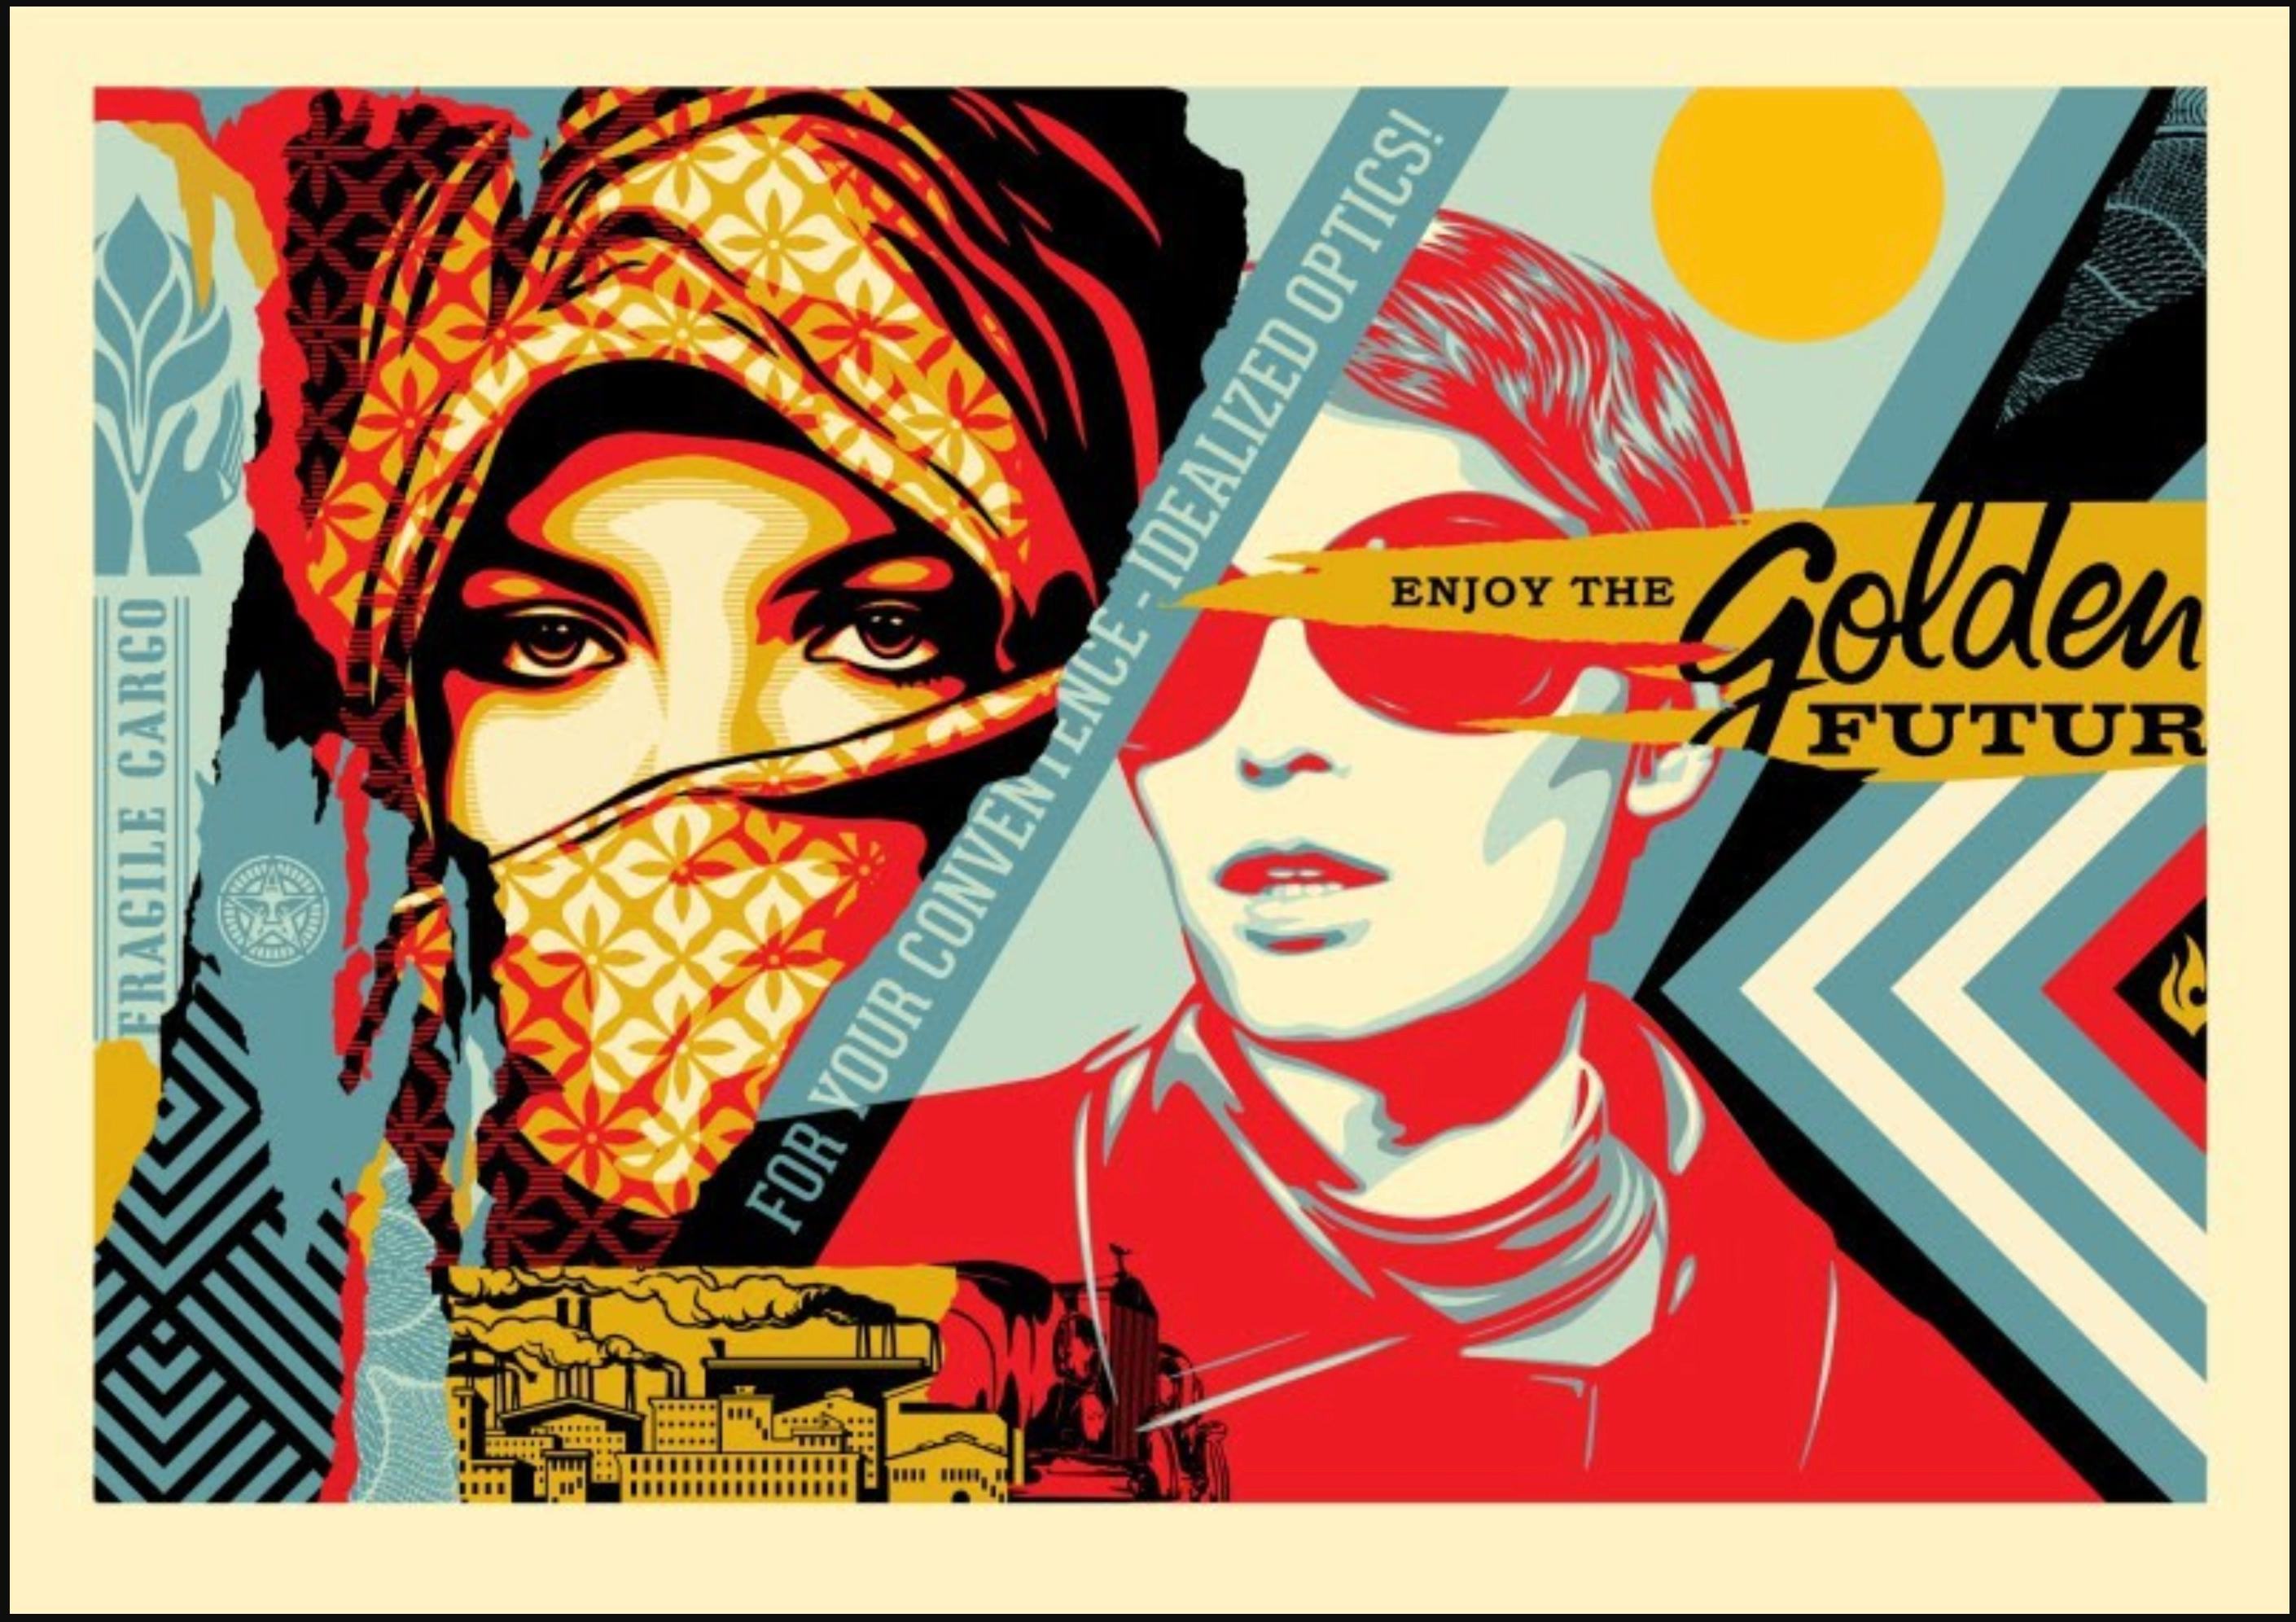 Shepard Fairey - Obey Giant - Golden Future - Urban Graffiti Street Art Print